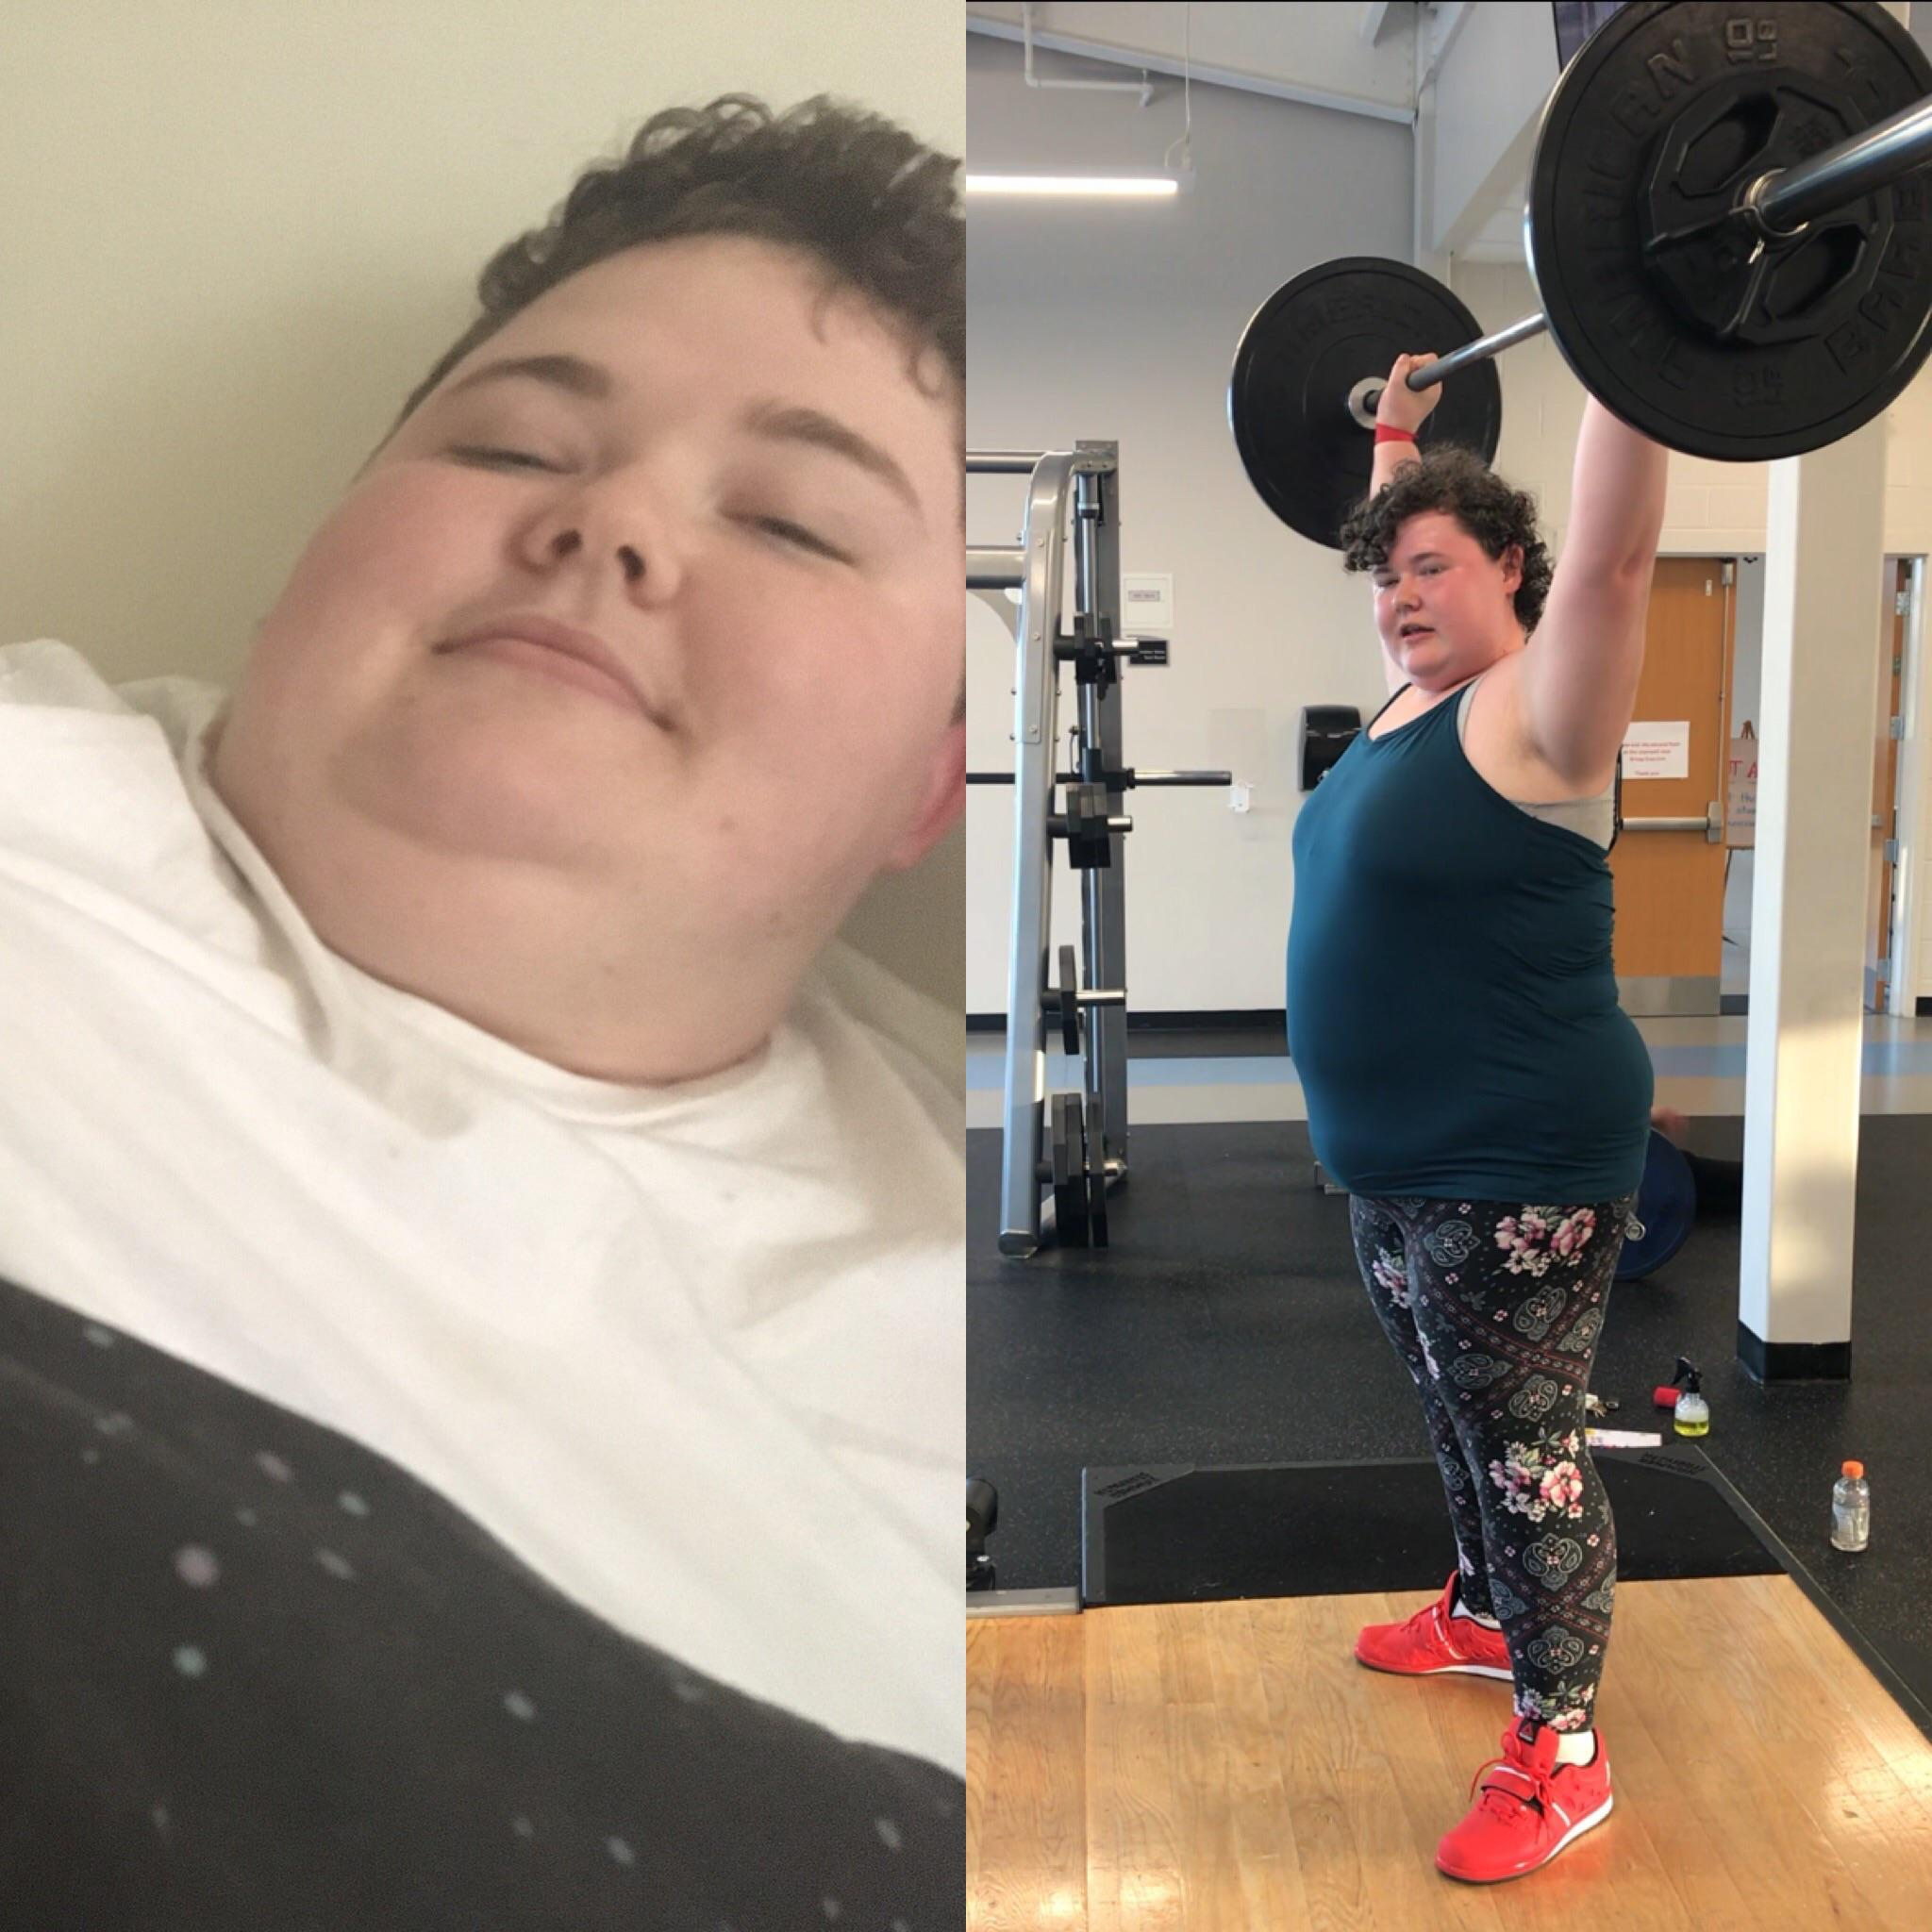 5 feet 9 Female Progress Pics of 85 lbs Weight Loss 415 lbs to 330 lbs